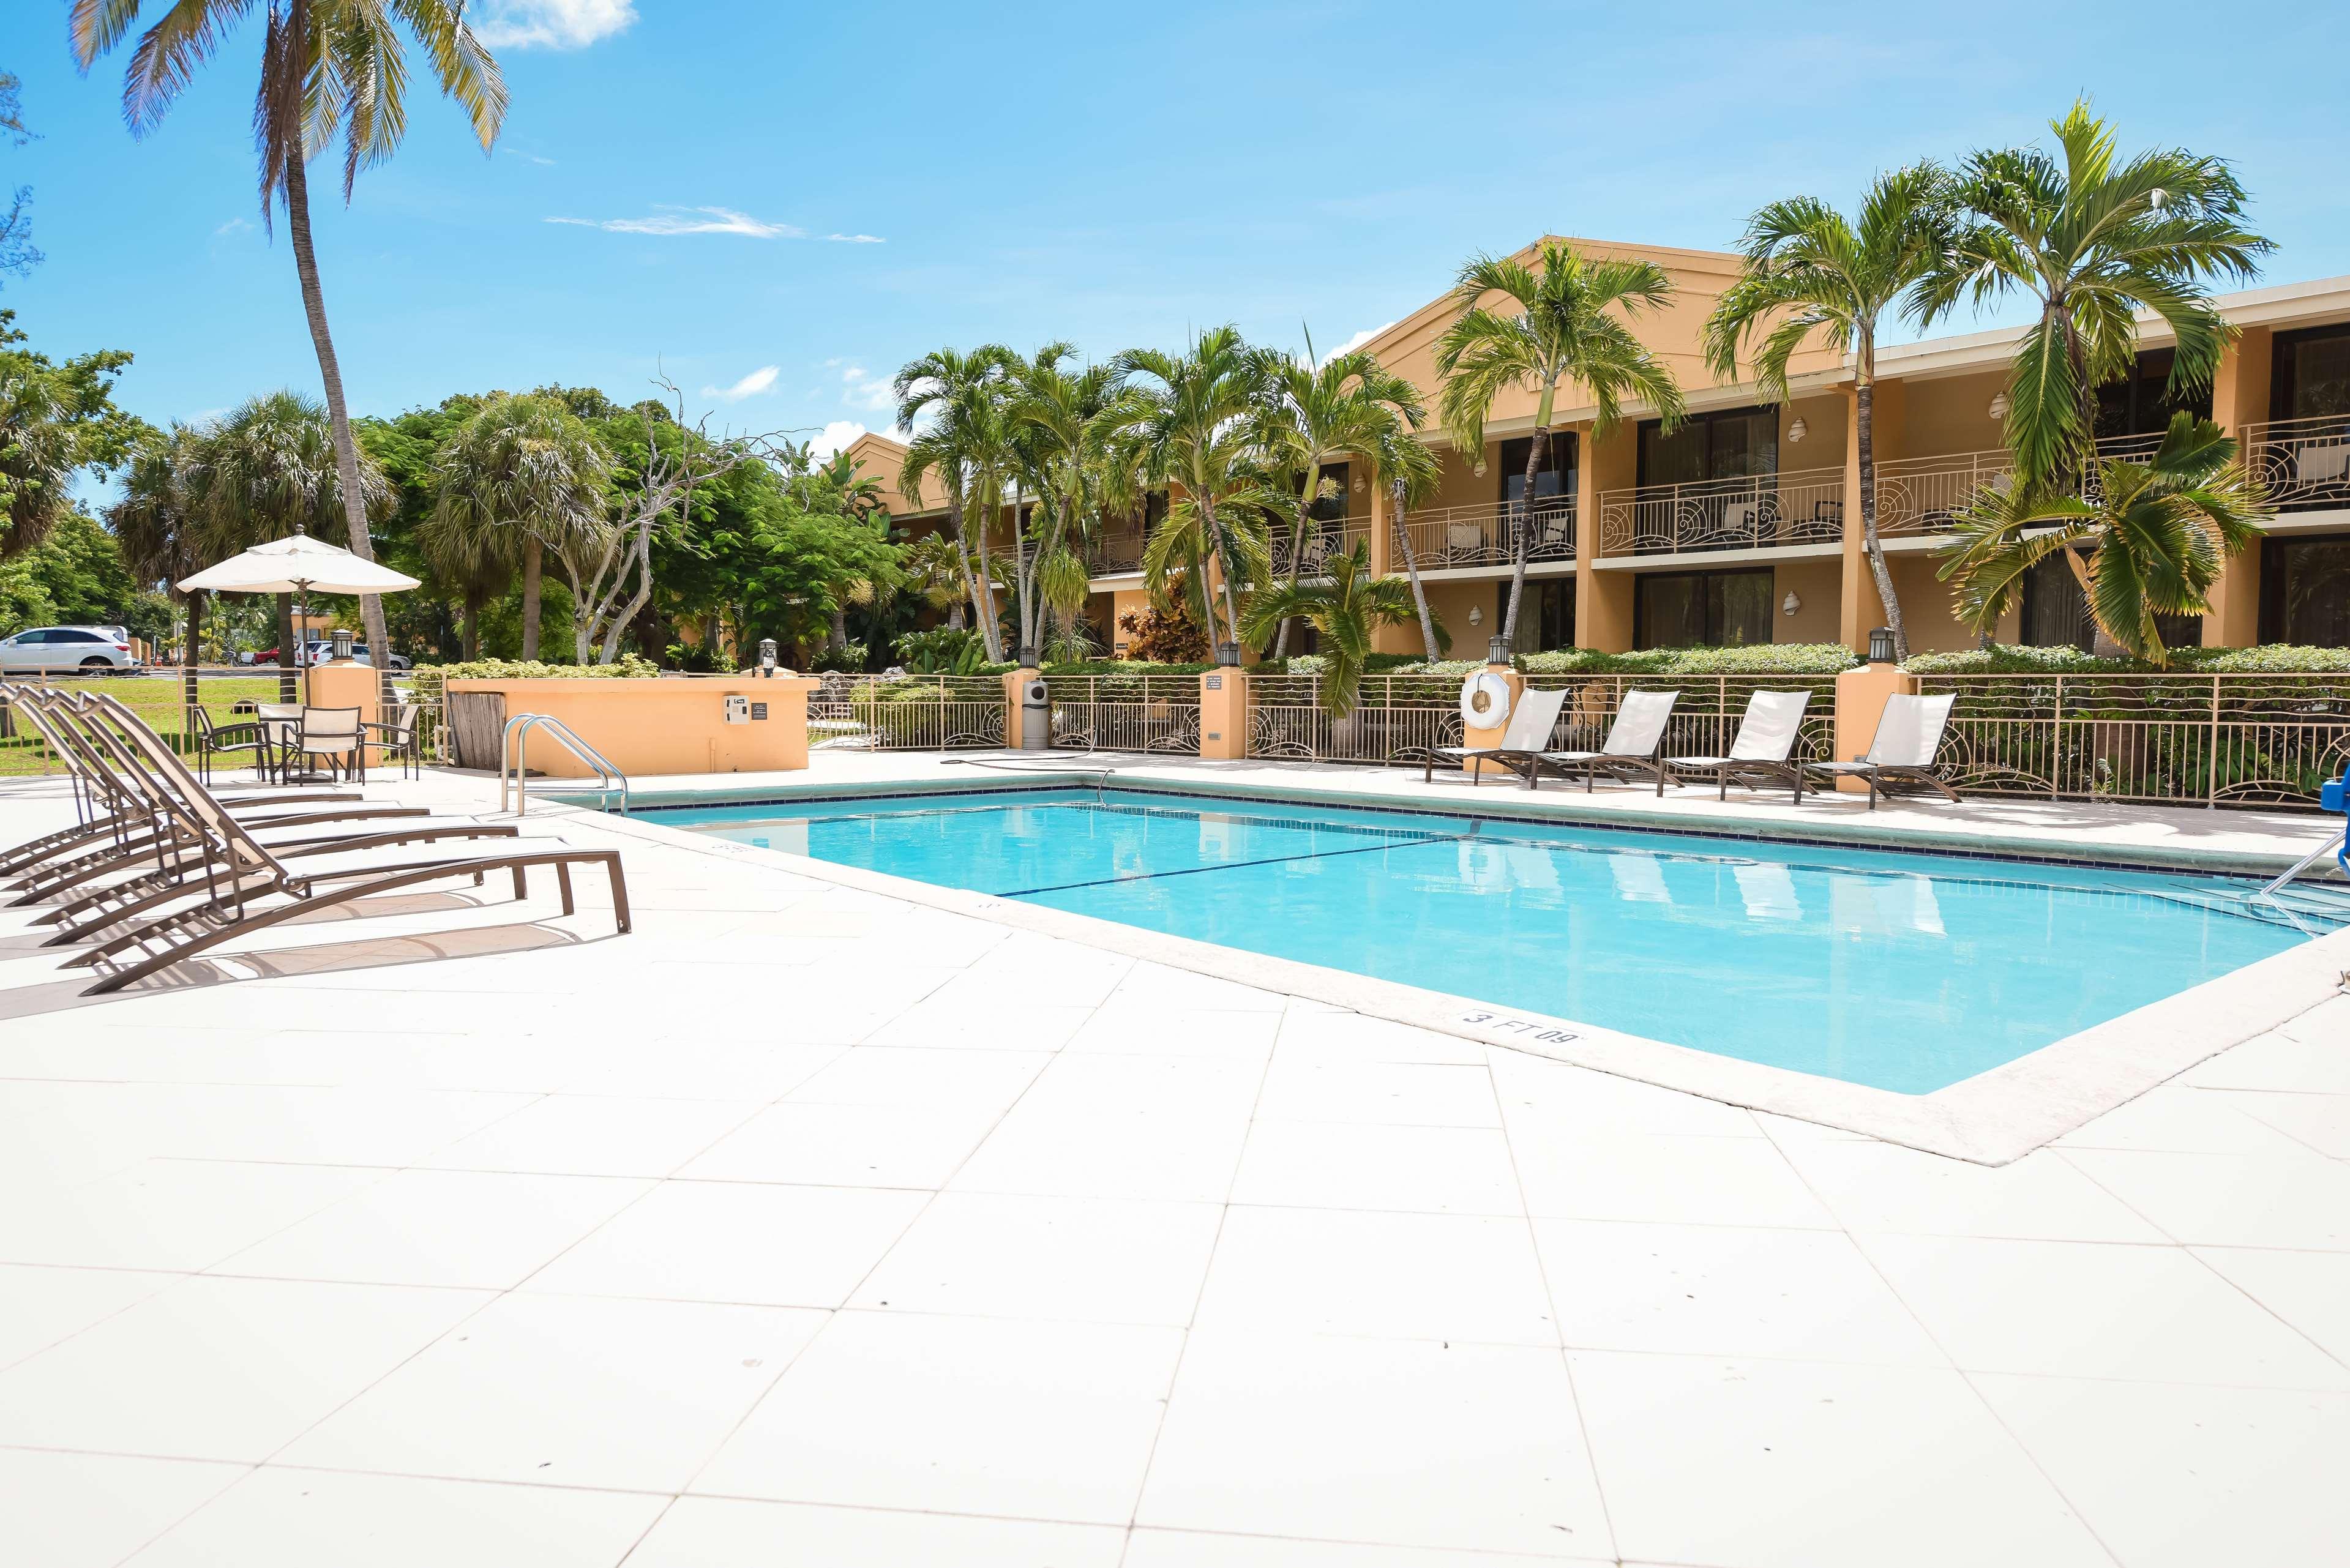 Hampton Inn Key Largo, FL image 0